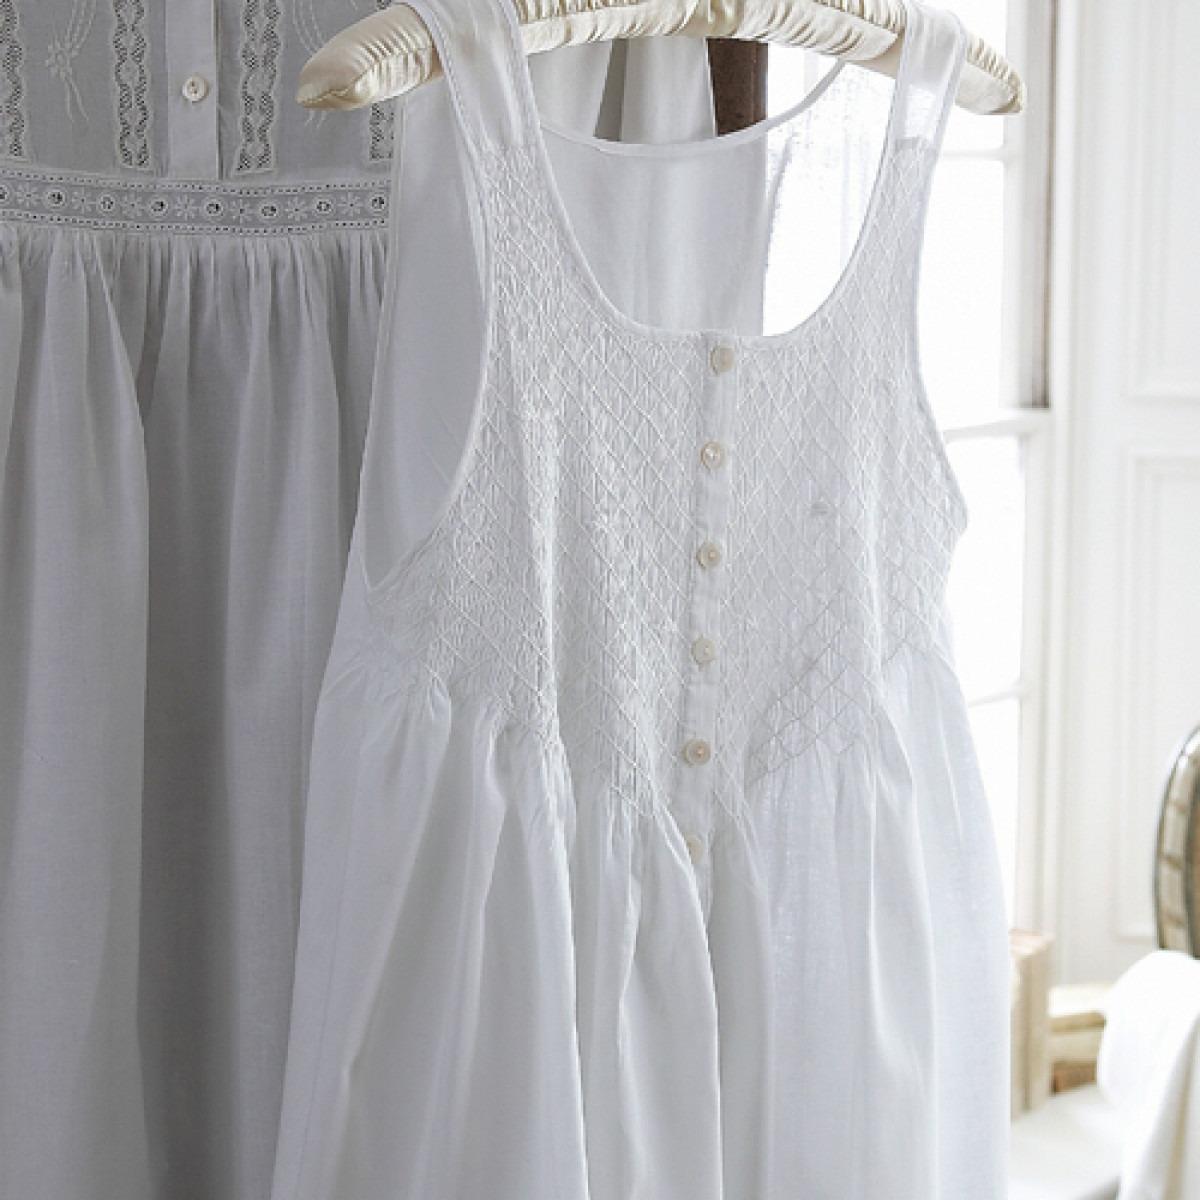 Beatrice nightdress